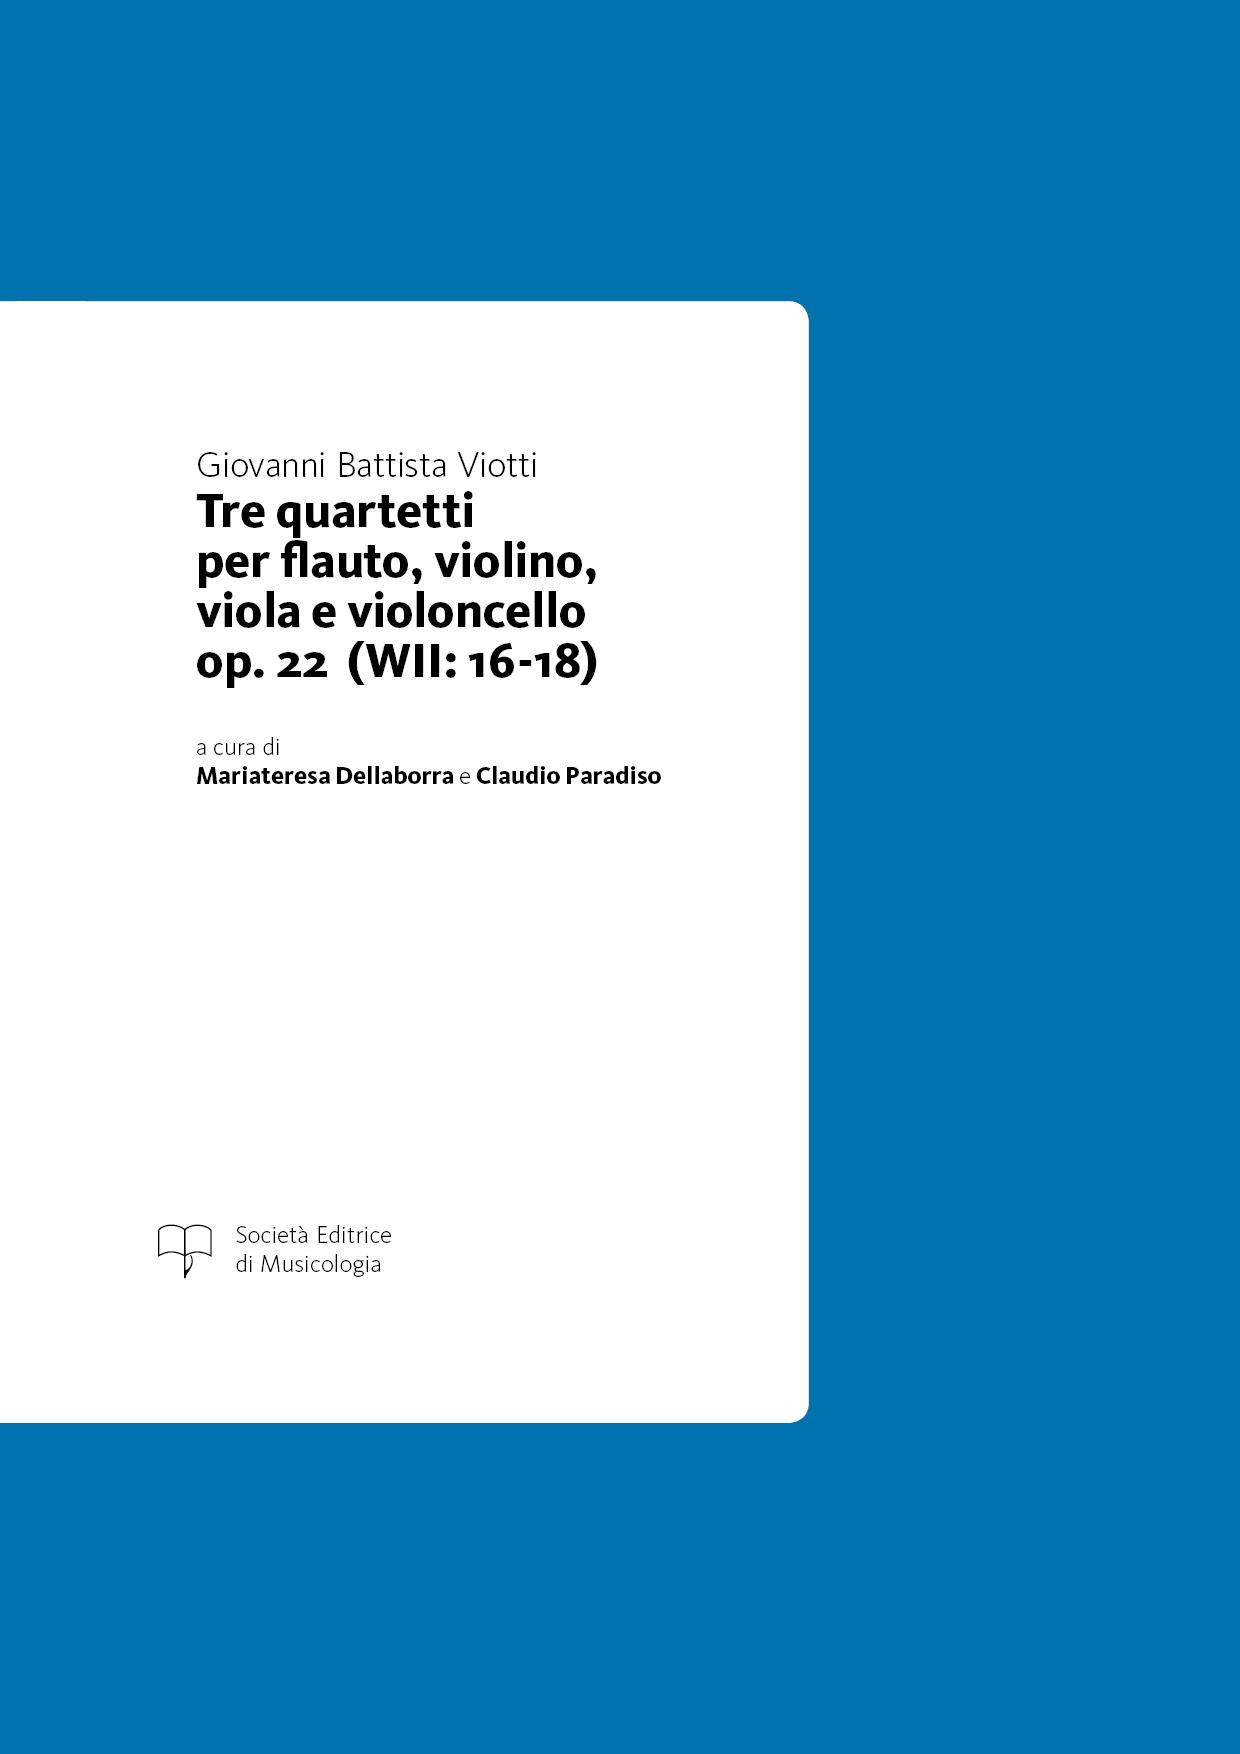 Viotti - Tre quartetti op. 22 (WII: 16-18)